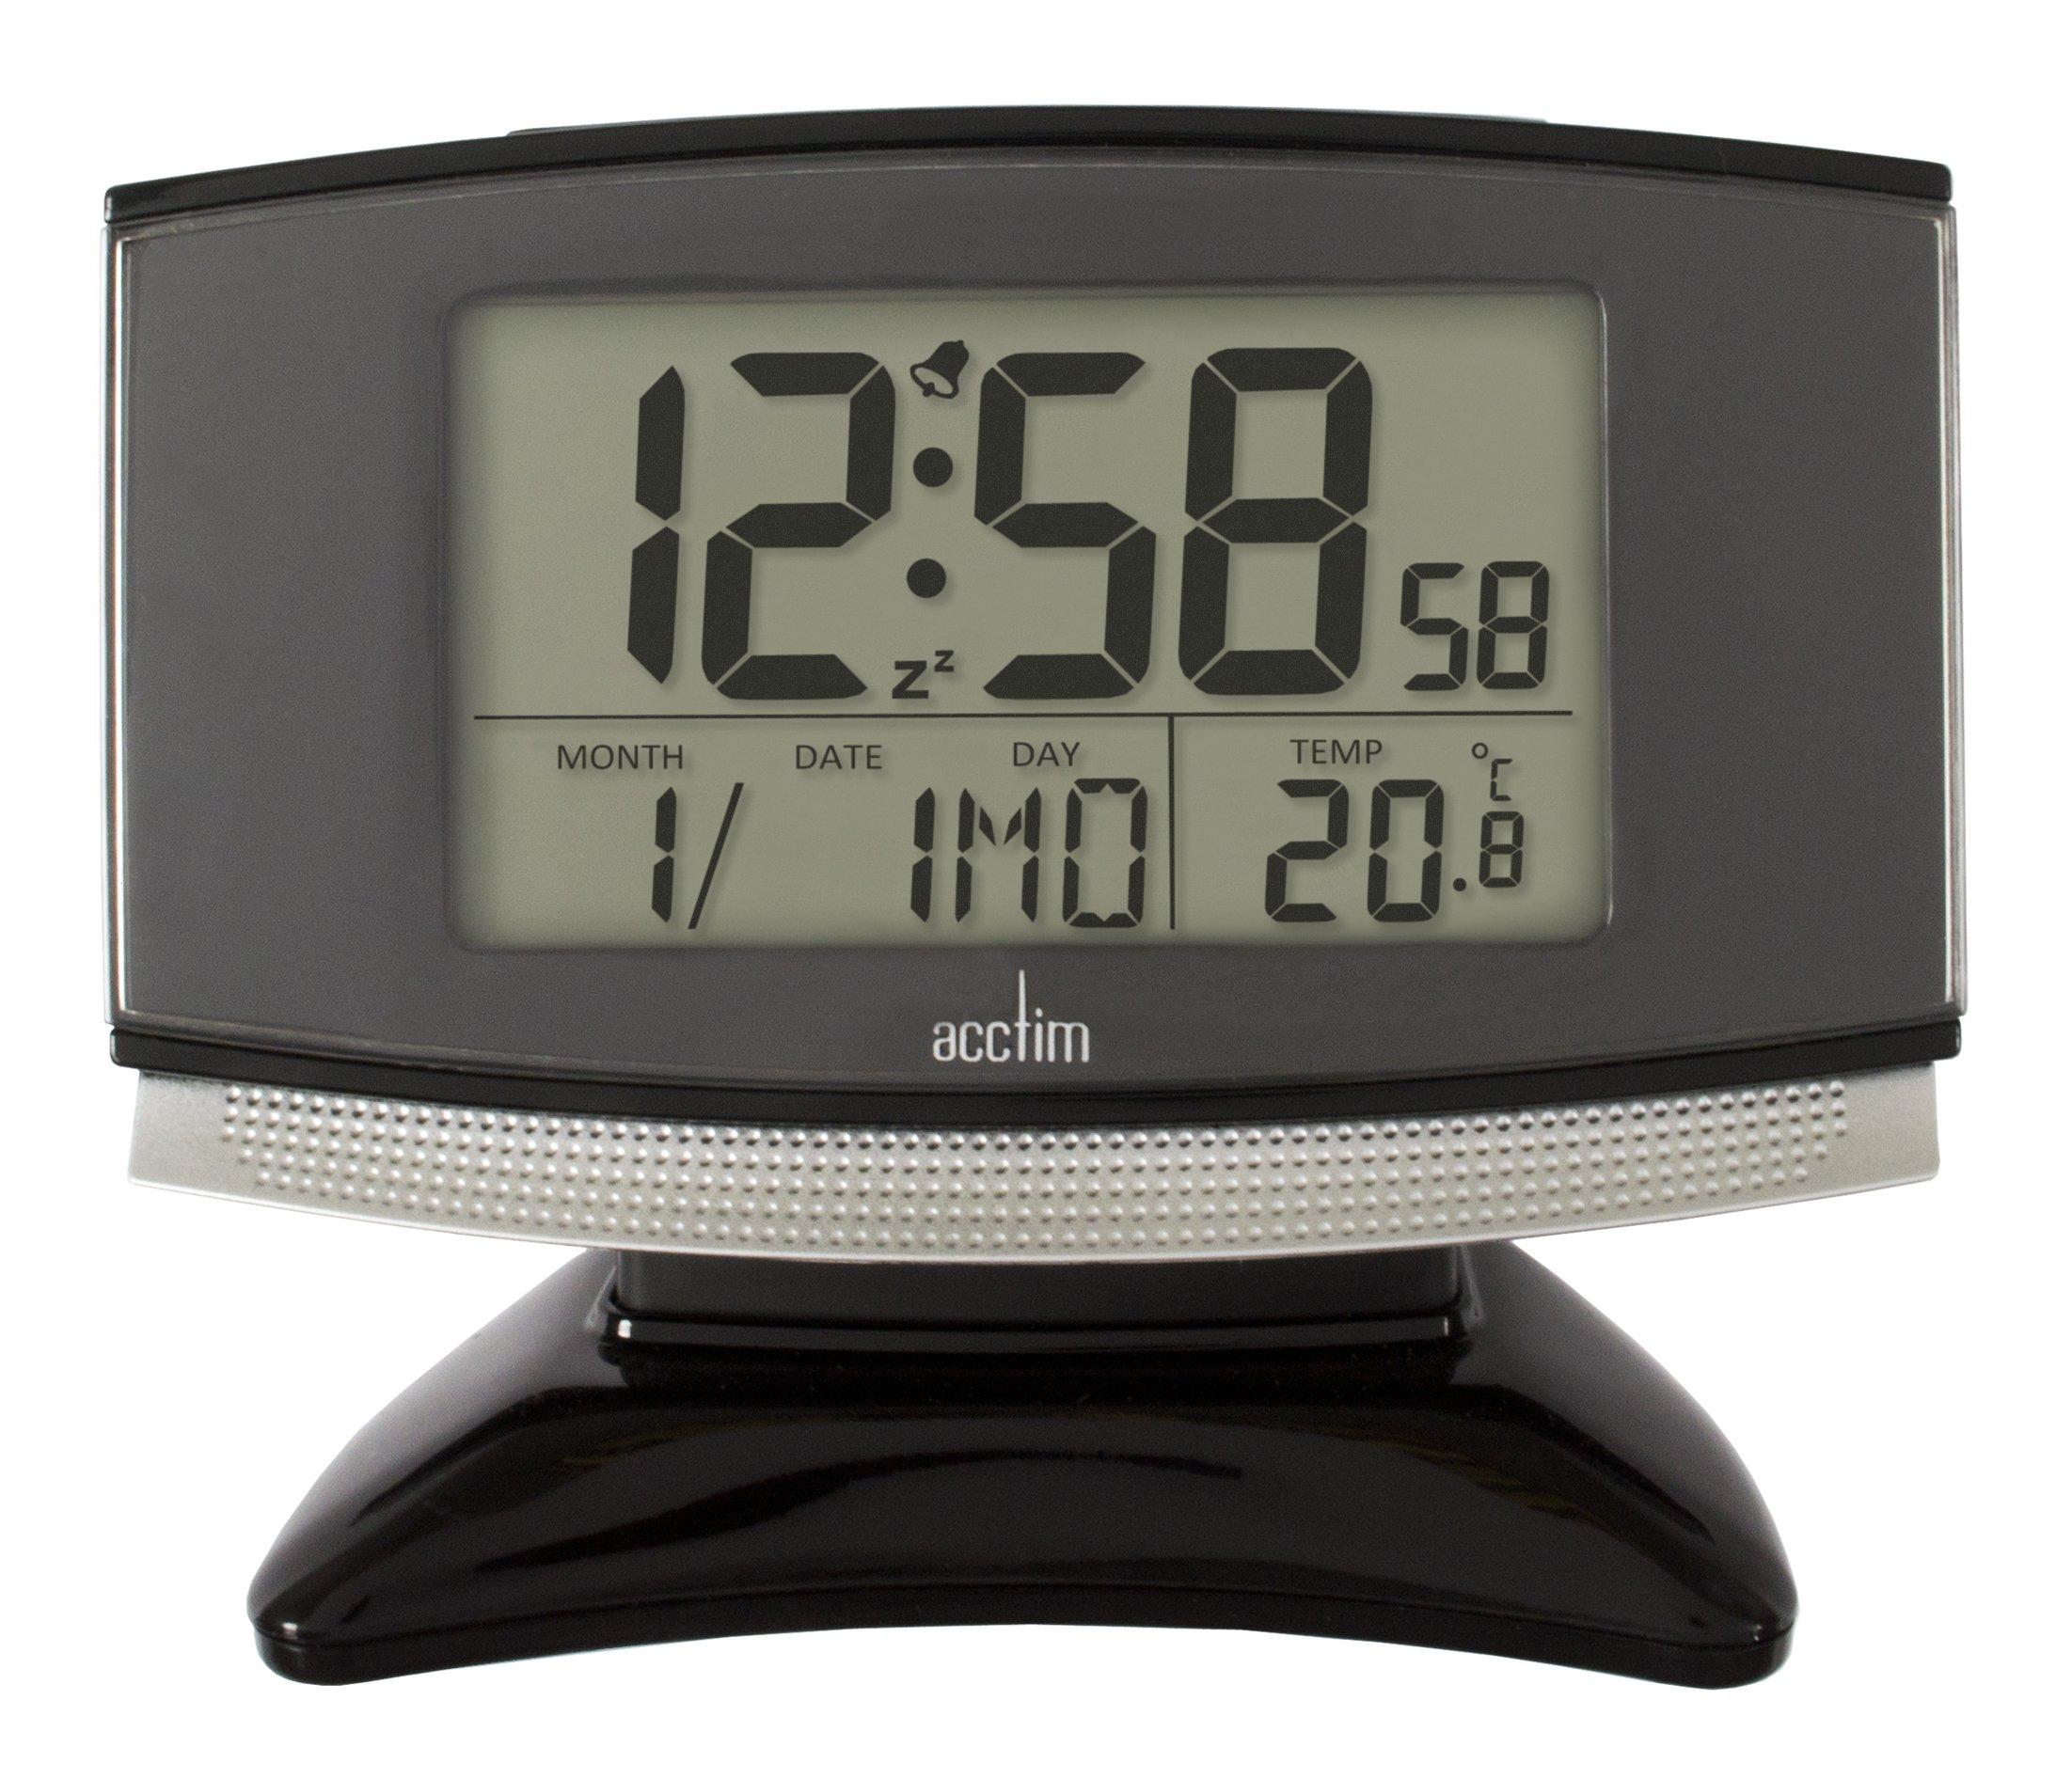 acctim 71207 acura smartlite radio controlled alarm clock black ebay. Black Bedroom Furniture Sets. Home Design Ideas